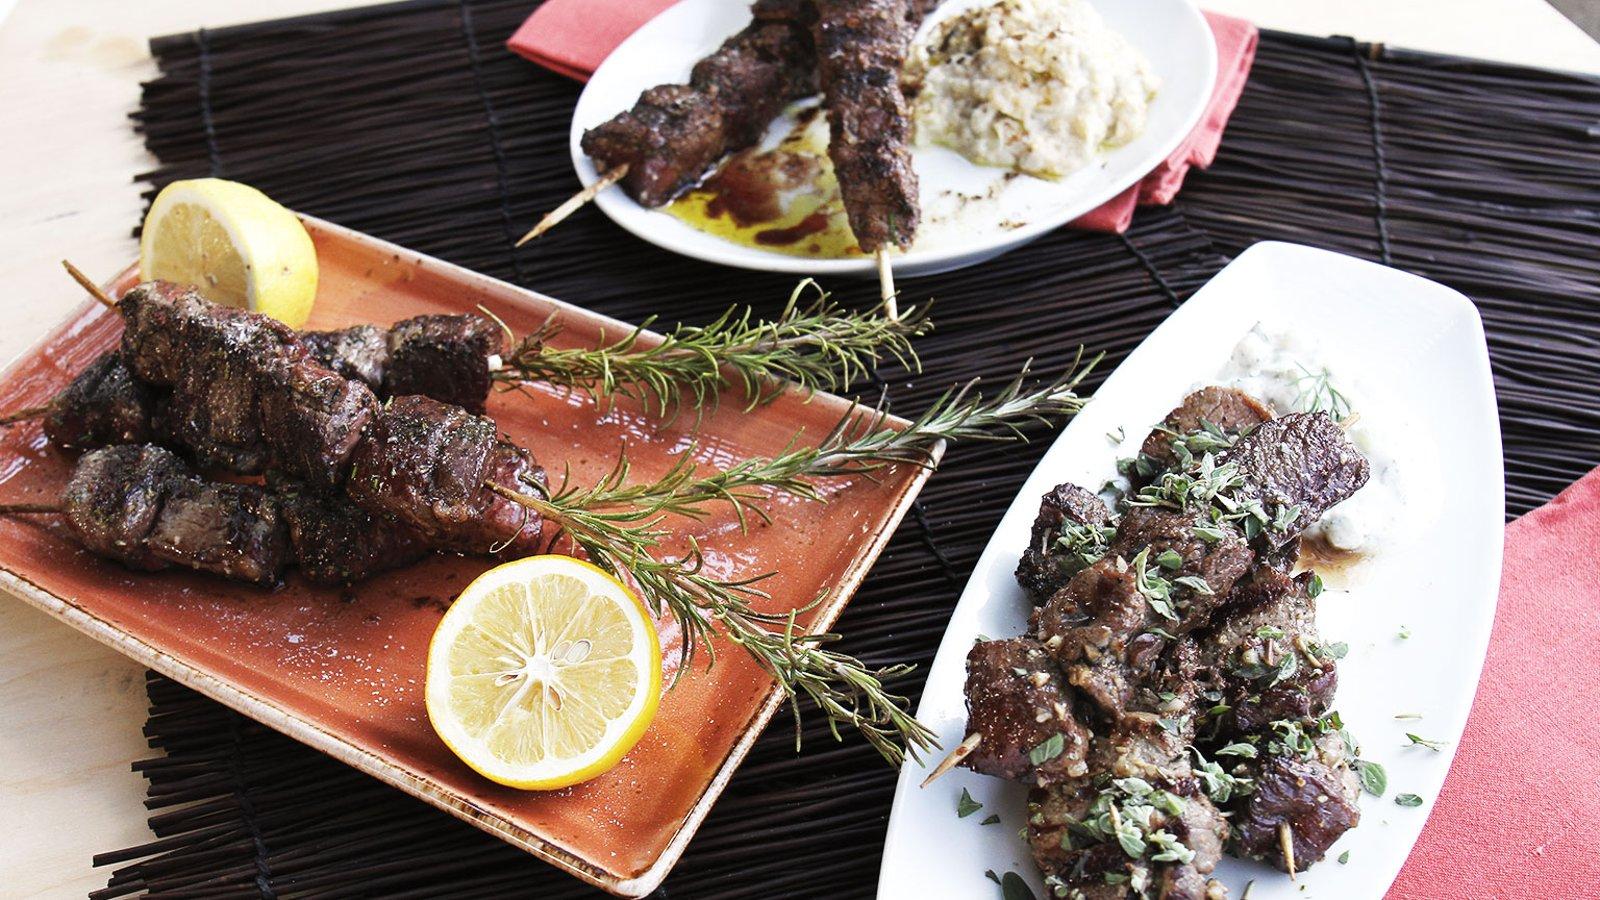 Mediterranean-Style Grilling